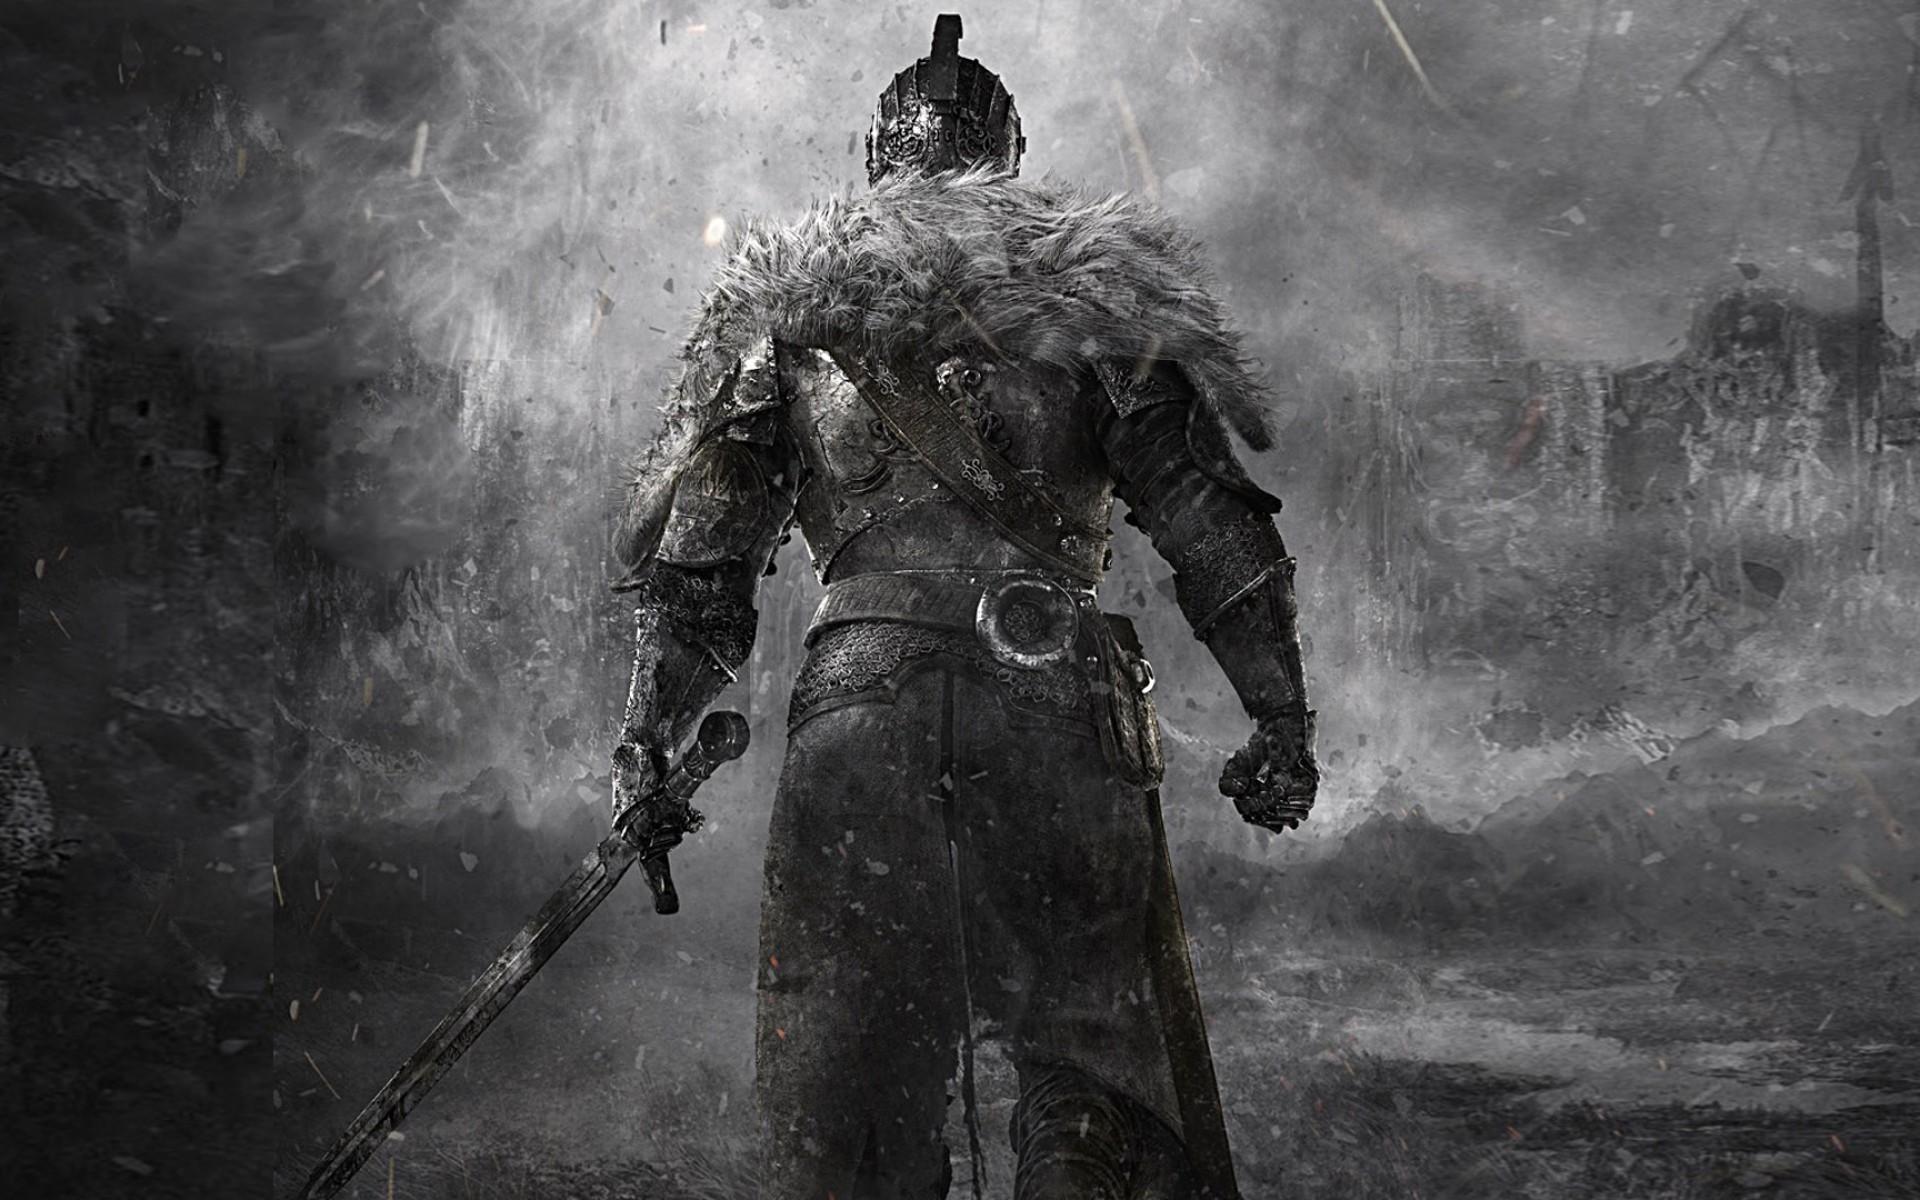 Dark Souls 2 Wallpaper Hd: Dark Souls II HD Wallpaper